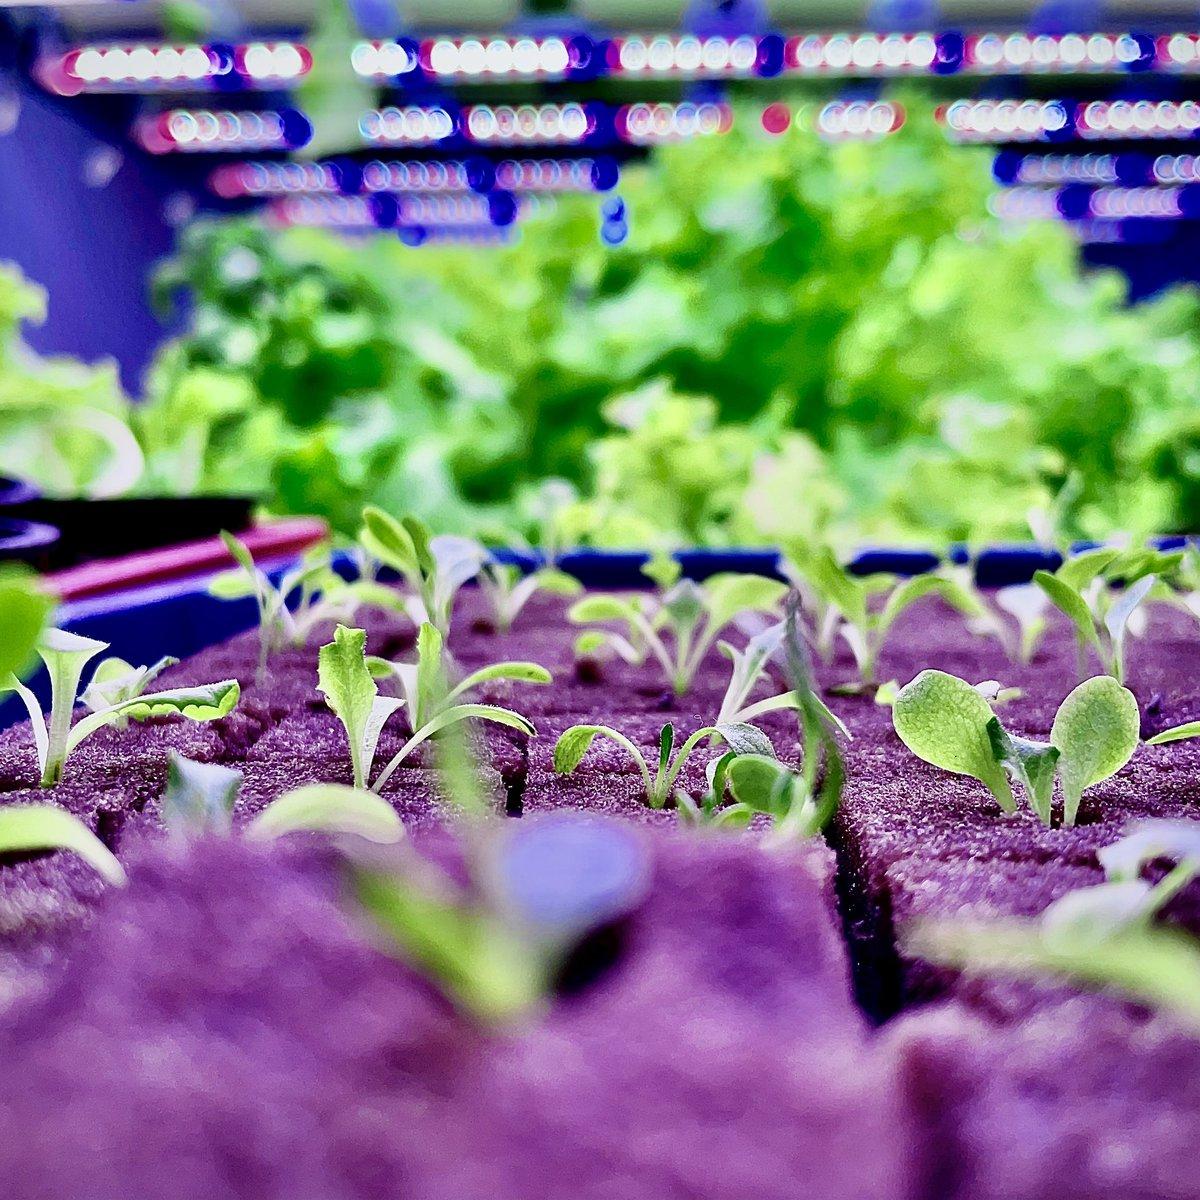 See what Light💡🌱can do! This pictures of Lollorosso taken recently, @amdavadiorganic farm.  #nexselgrown #nexsel #agtech #indoorfarming #hydroponics #verticalfarming #urbanfarming #farming #microgreens #indoorgardens #lollorosso https://t.co/lzwVugBSgU